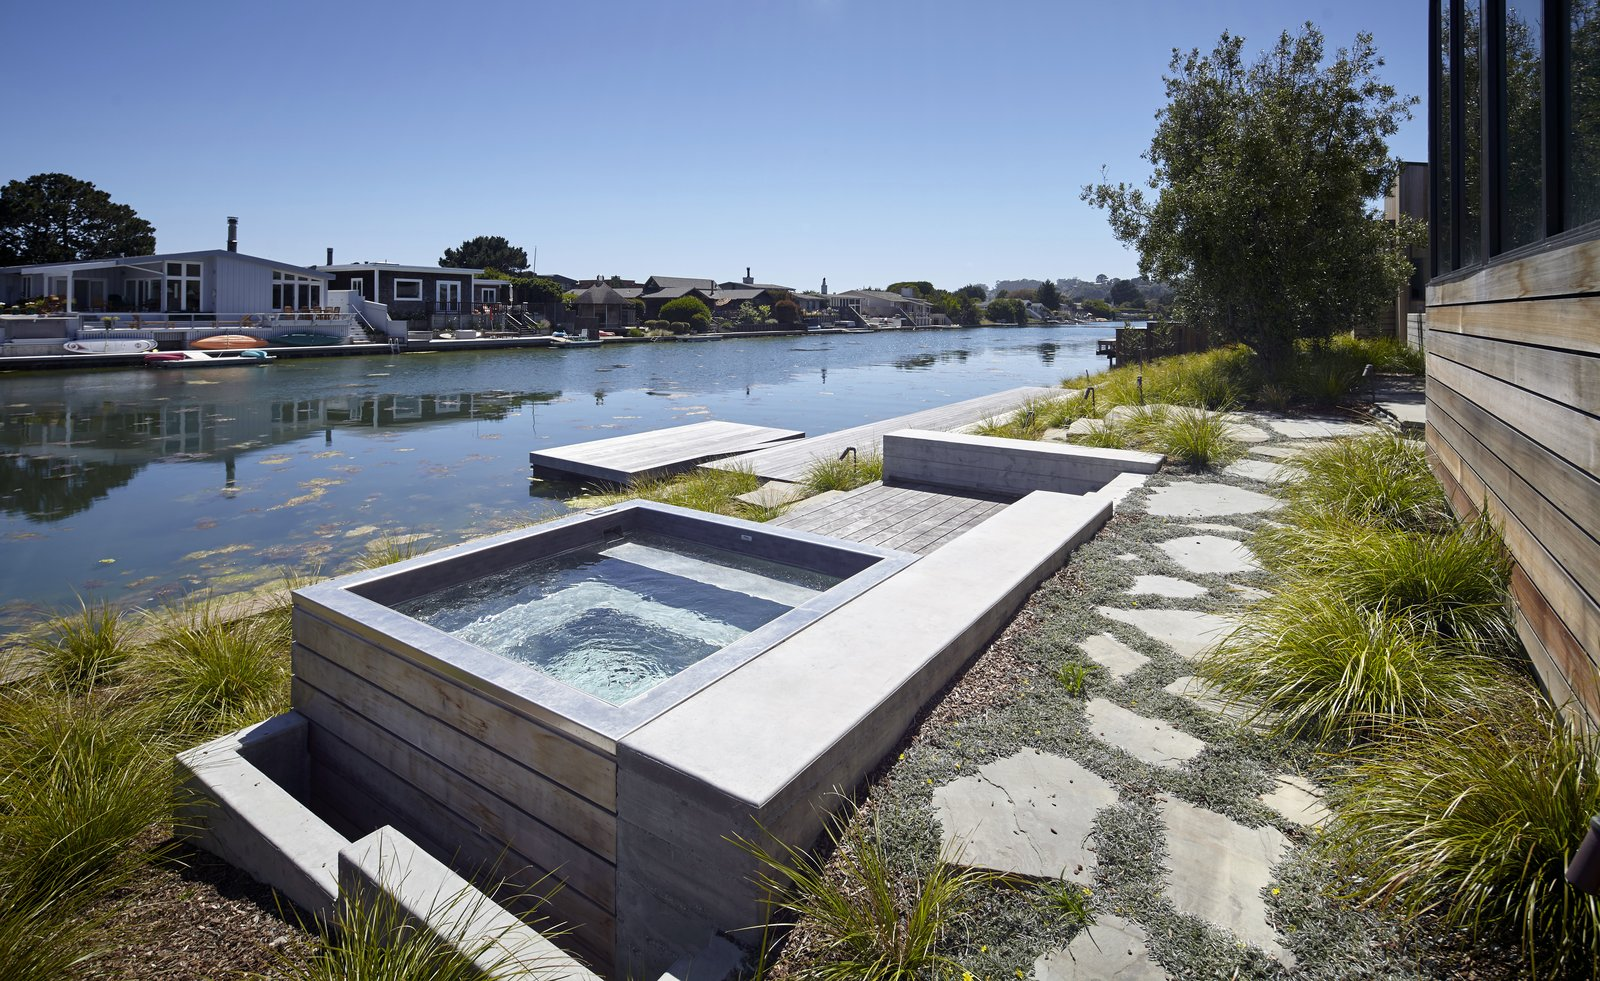 #TurnbullGriffinHaesloop #outdoor #landscape #hottub #lagoon #dock  Stinson Beach Lagoon Residence by Turnbull Griffin Haesloop Architects